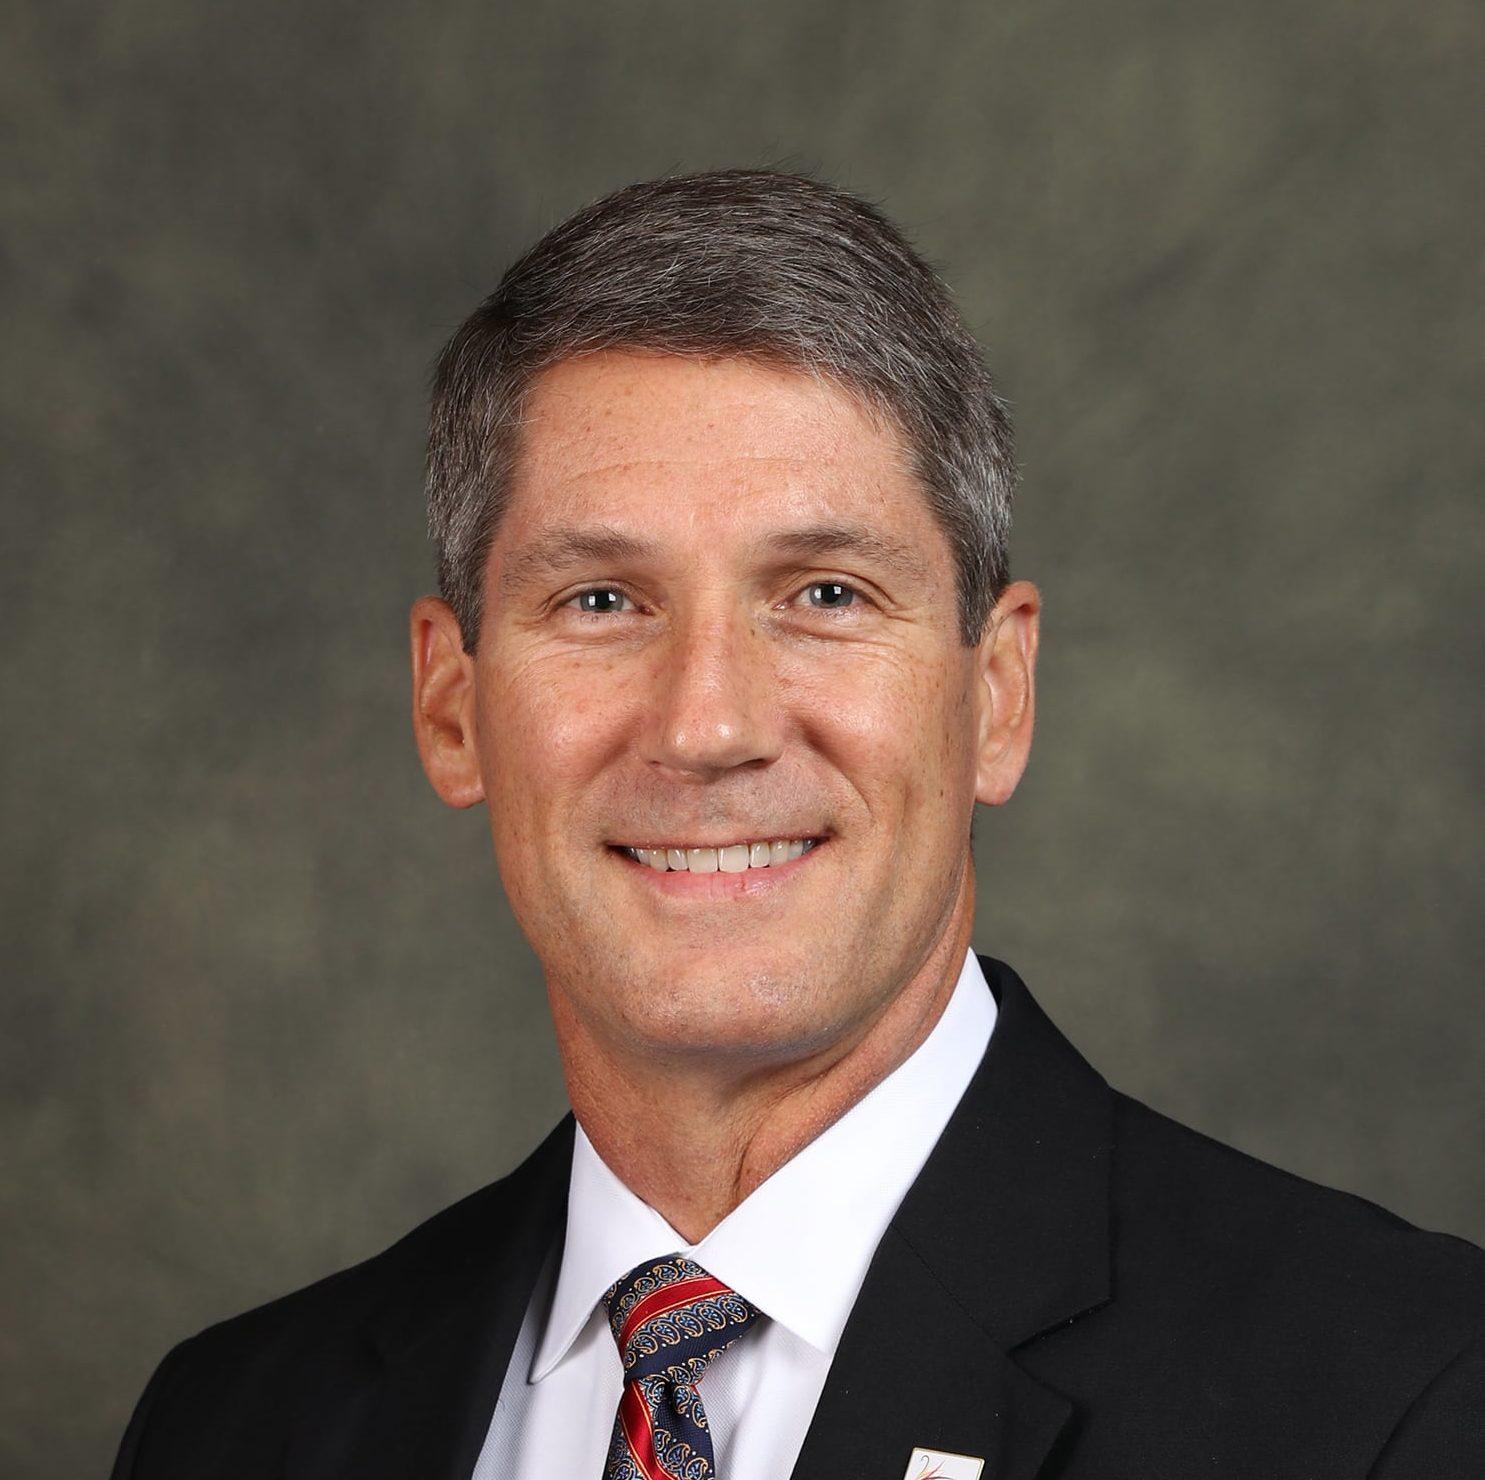 Scott Franklin